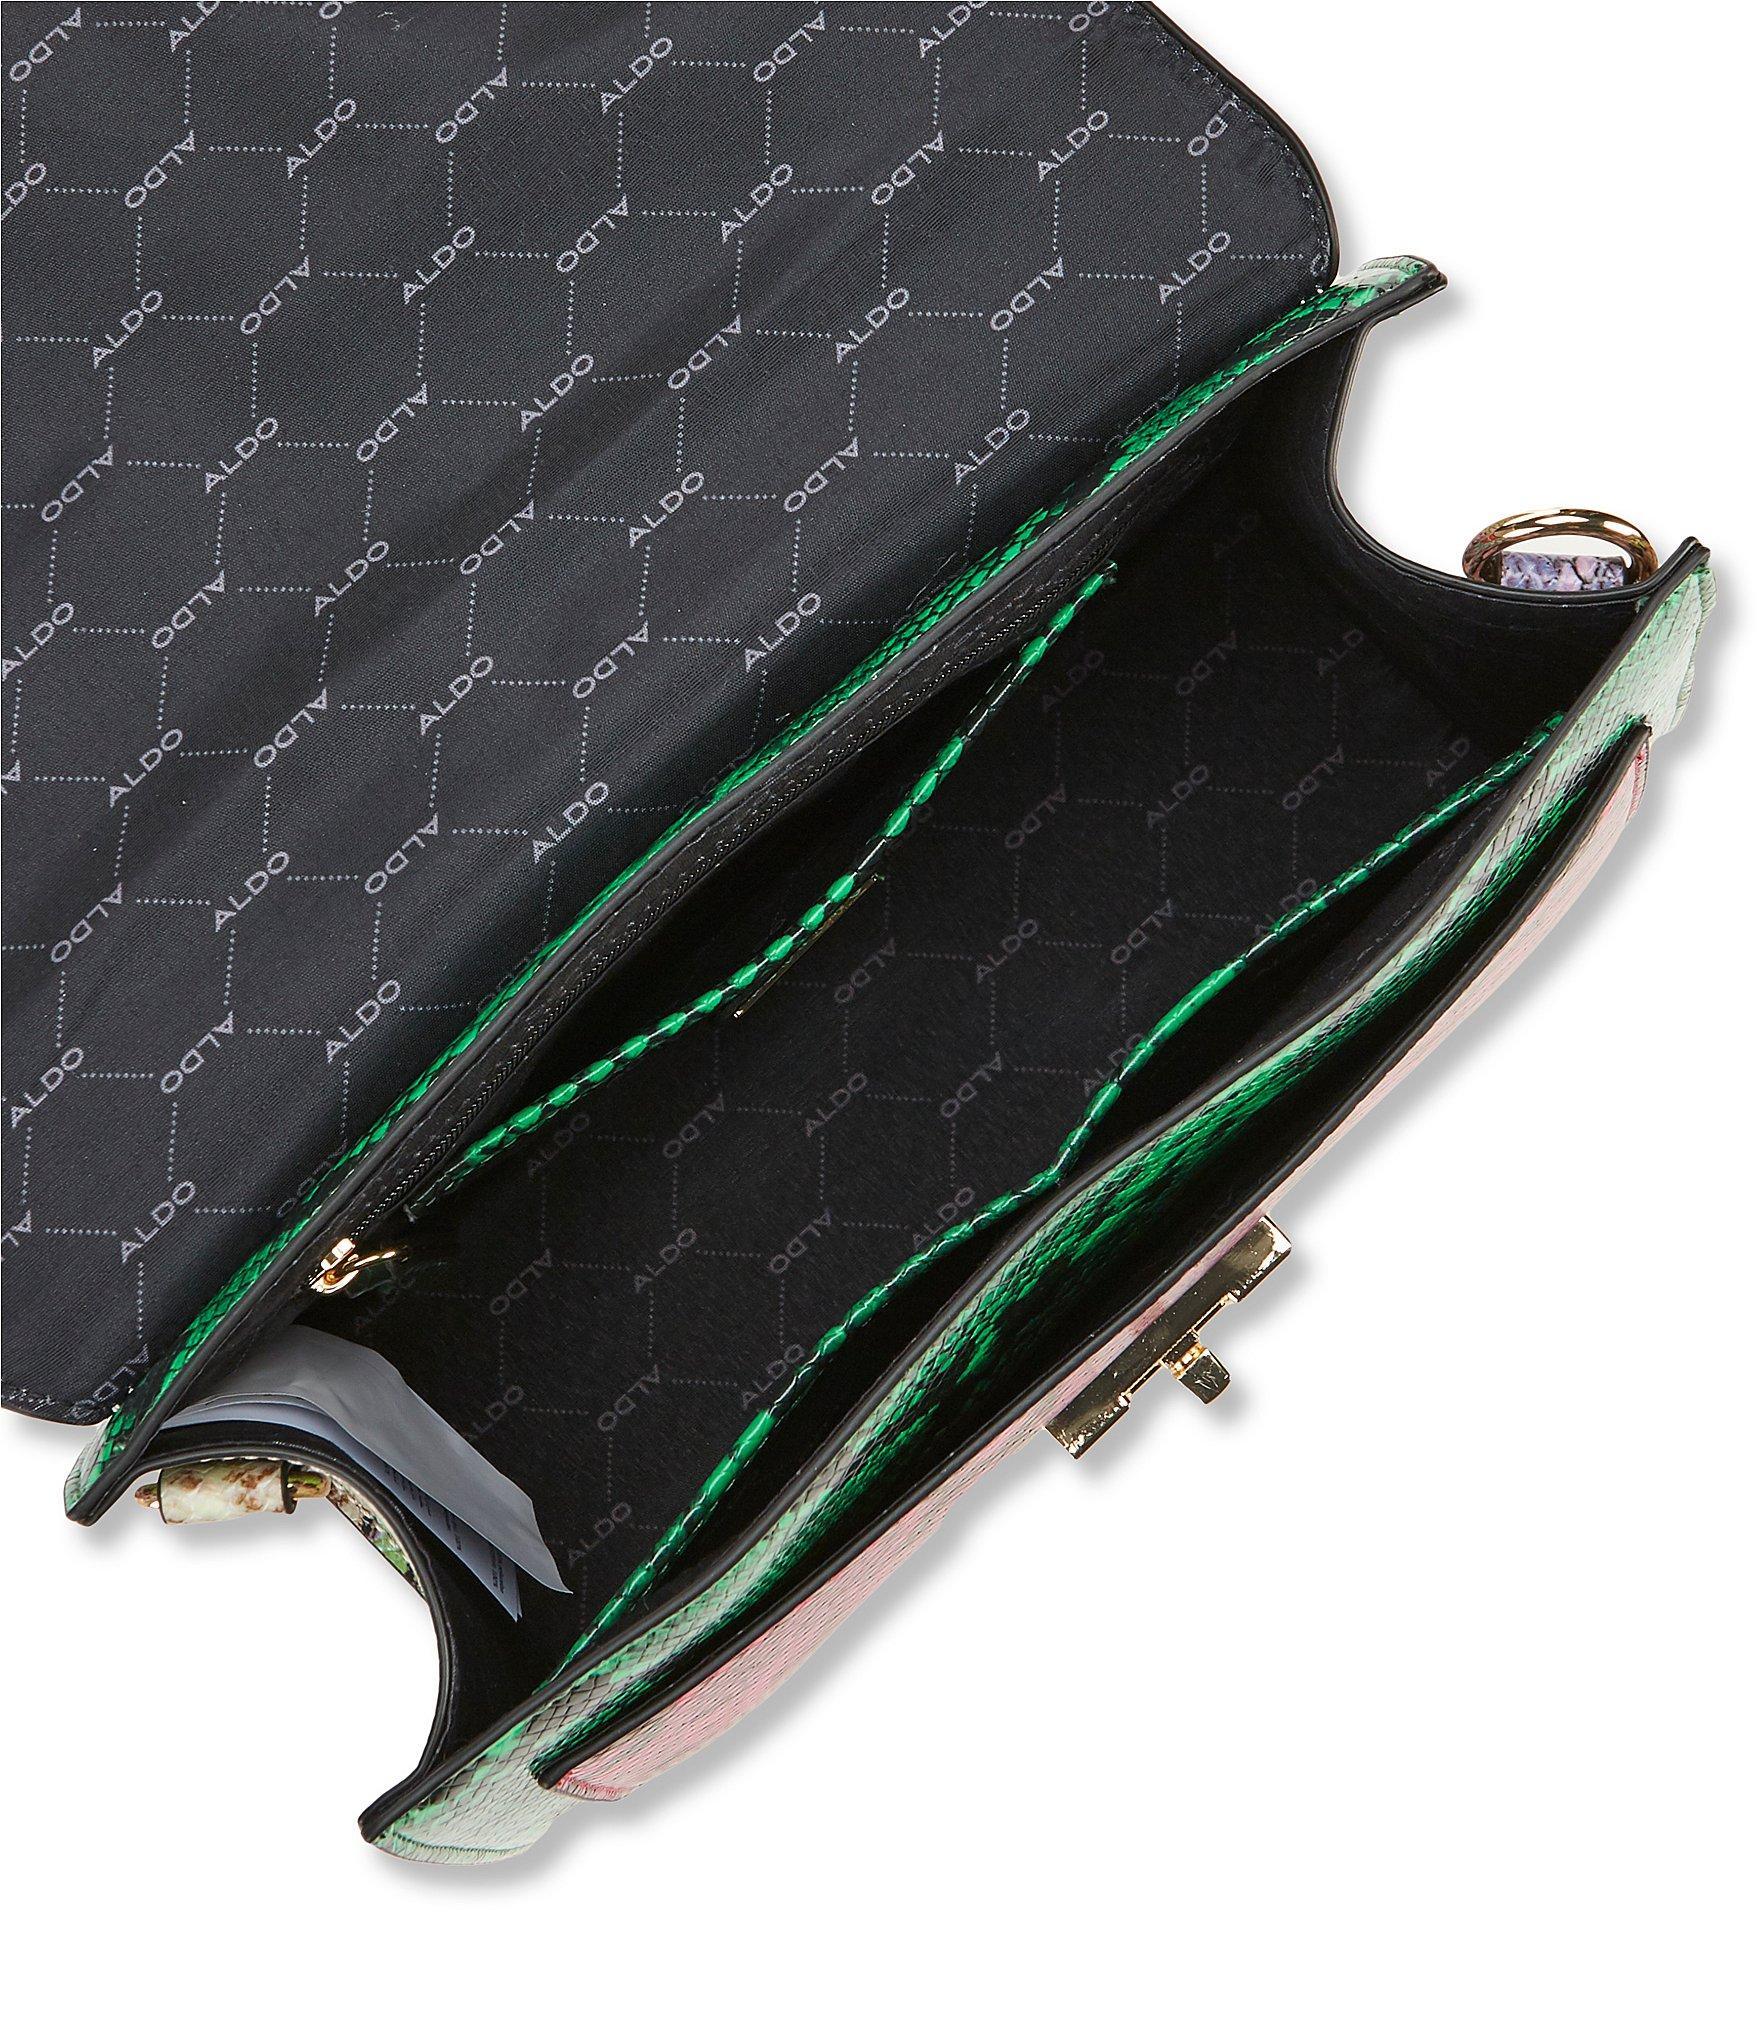 344314a2e35 Lyst - ALDO Snake  glendaa  Print Shoulder Bag With Scarf